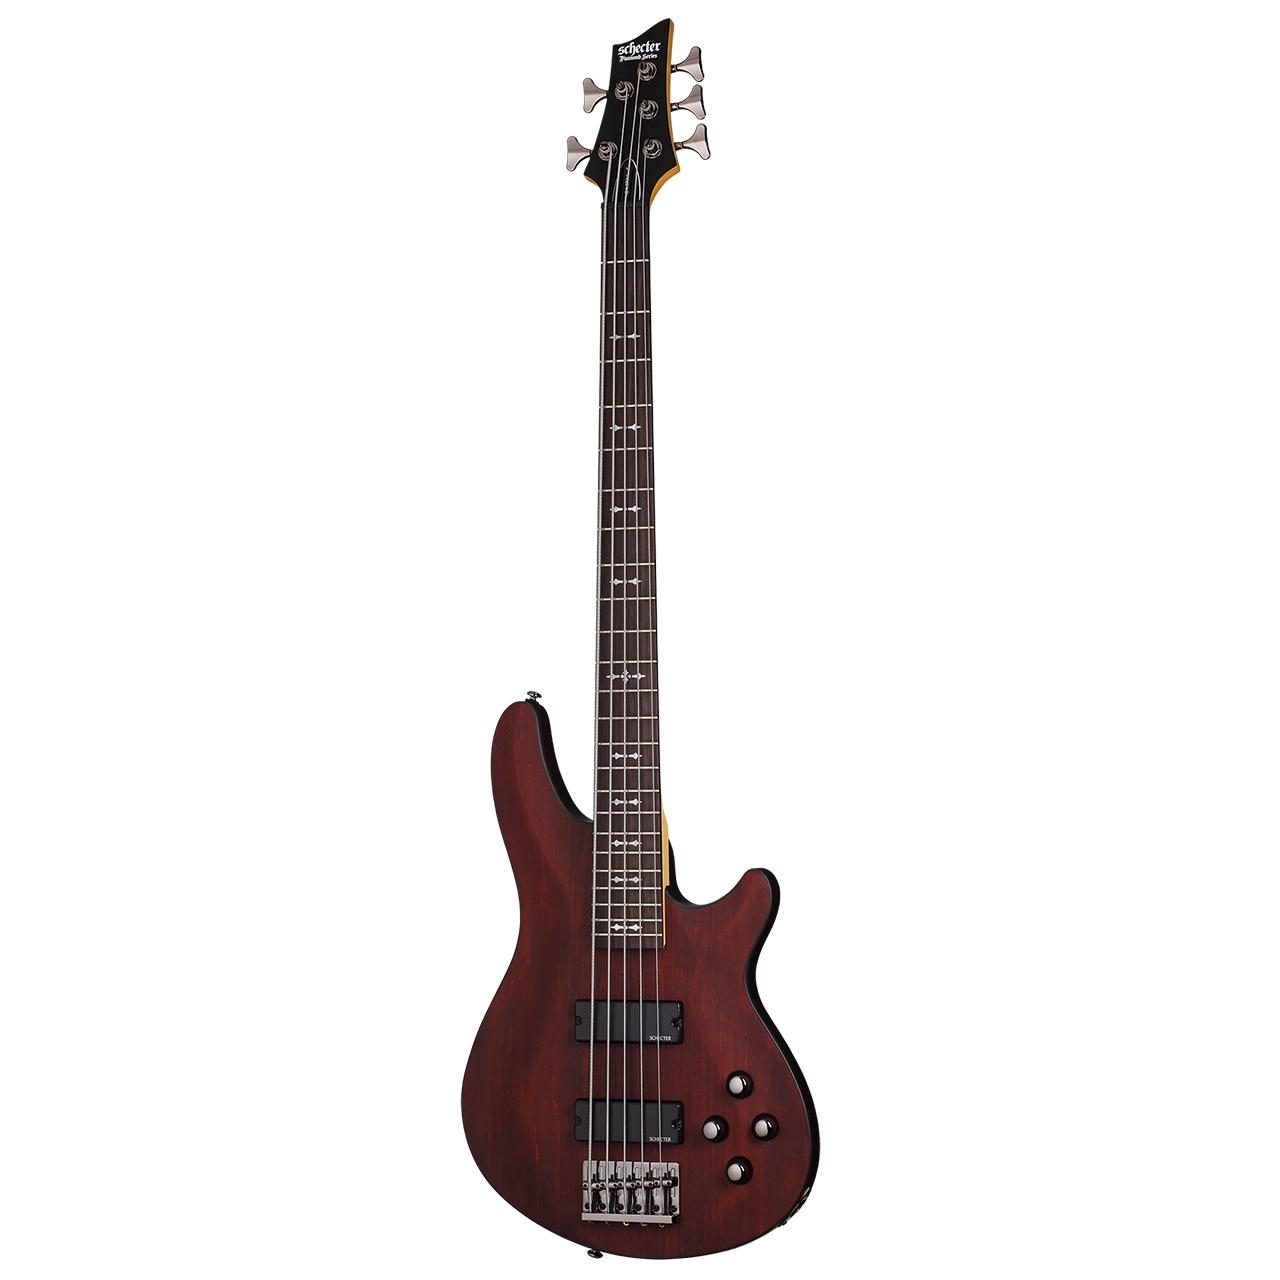 تصویر عکس گیتار بیس باس شکتر اسچکتر Schecter مدل اومن امن عمن Omen 5 2094 Bass Guitar سازودهل ساز و دهل sazodohol